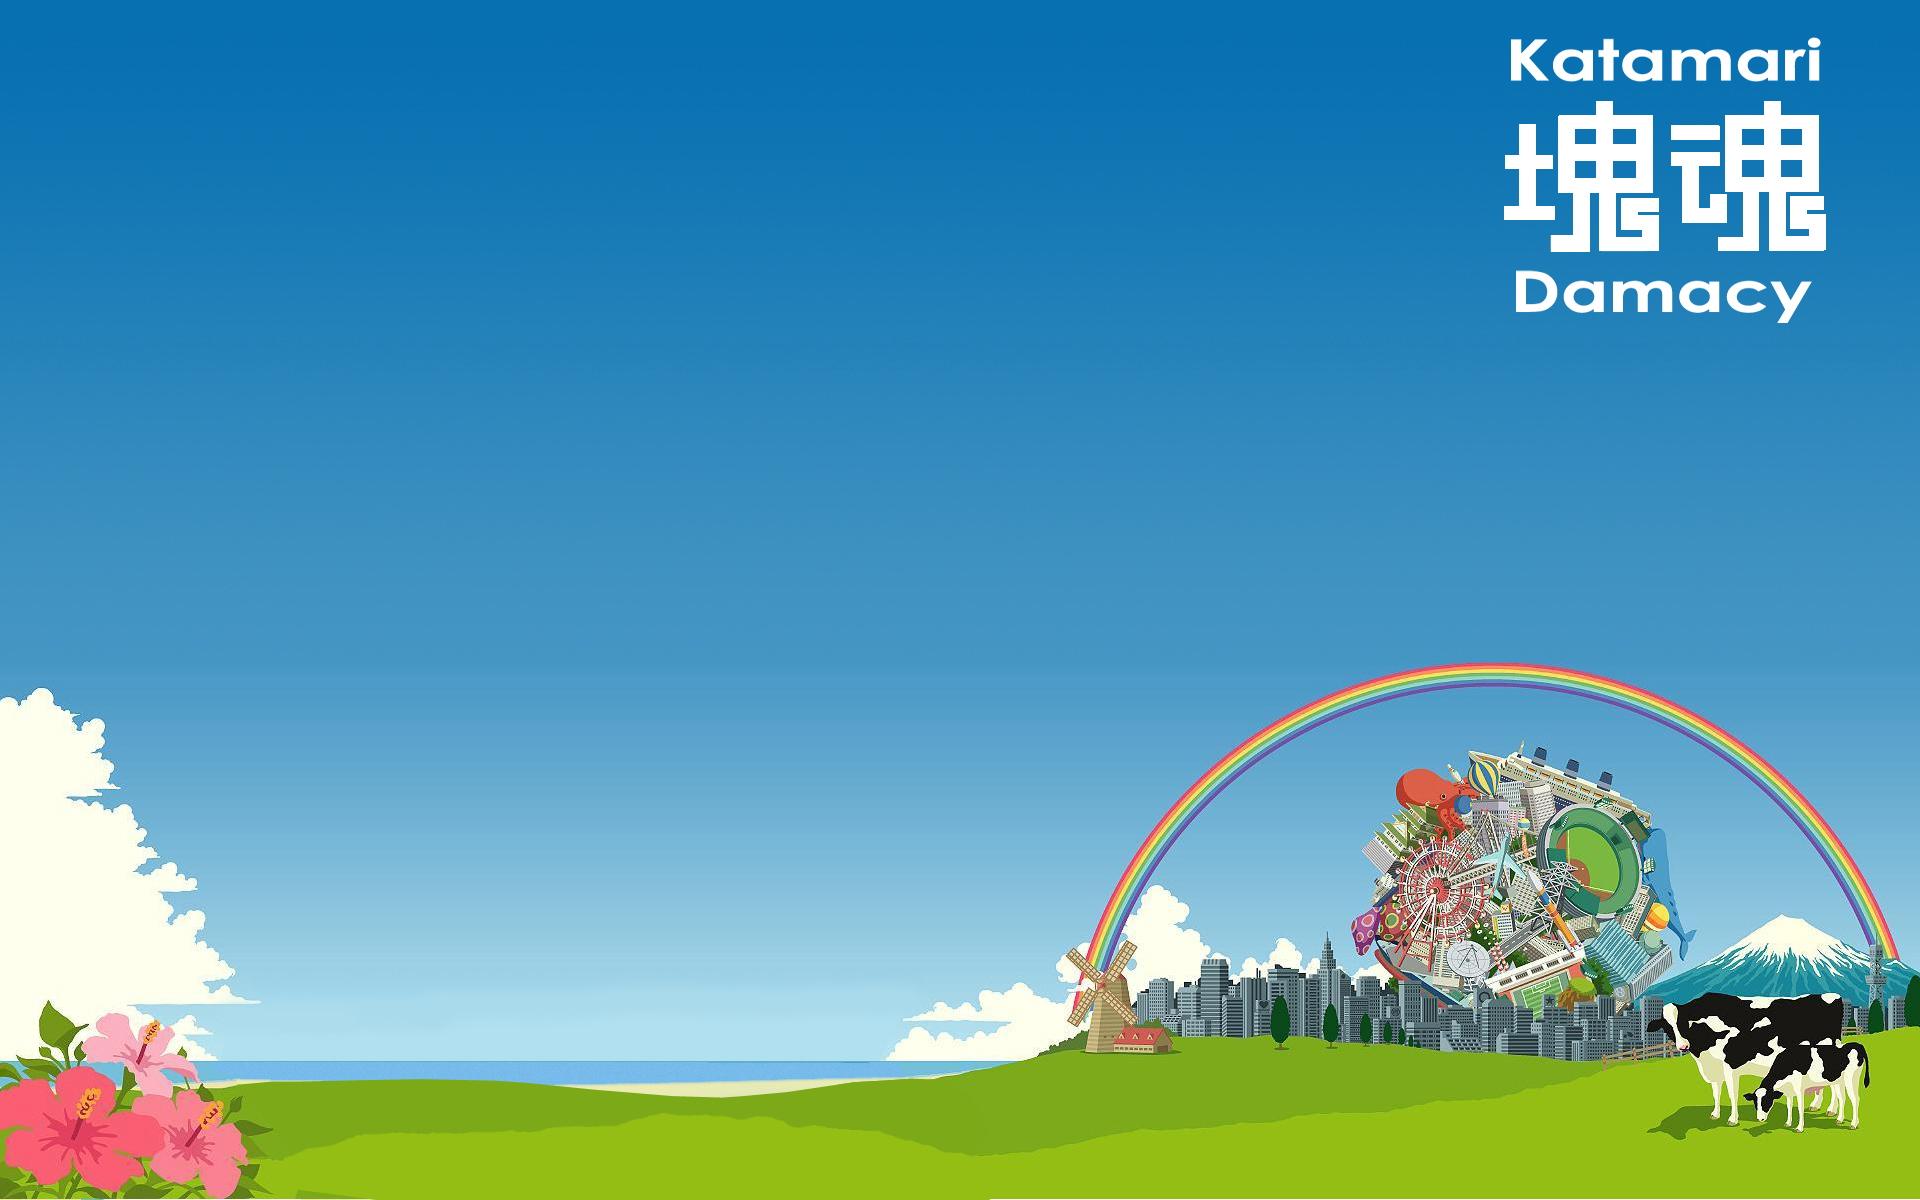 Katamari Damacy Wallpapers Katamari Damacy Myspace Backgrounds 1920x1200